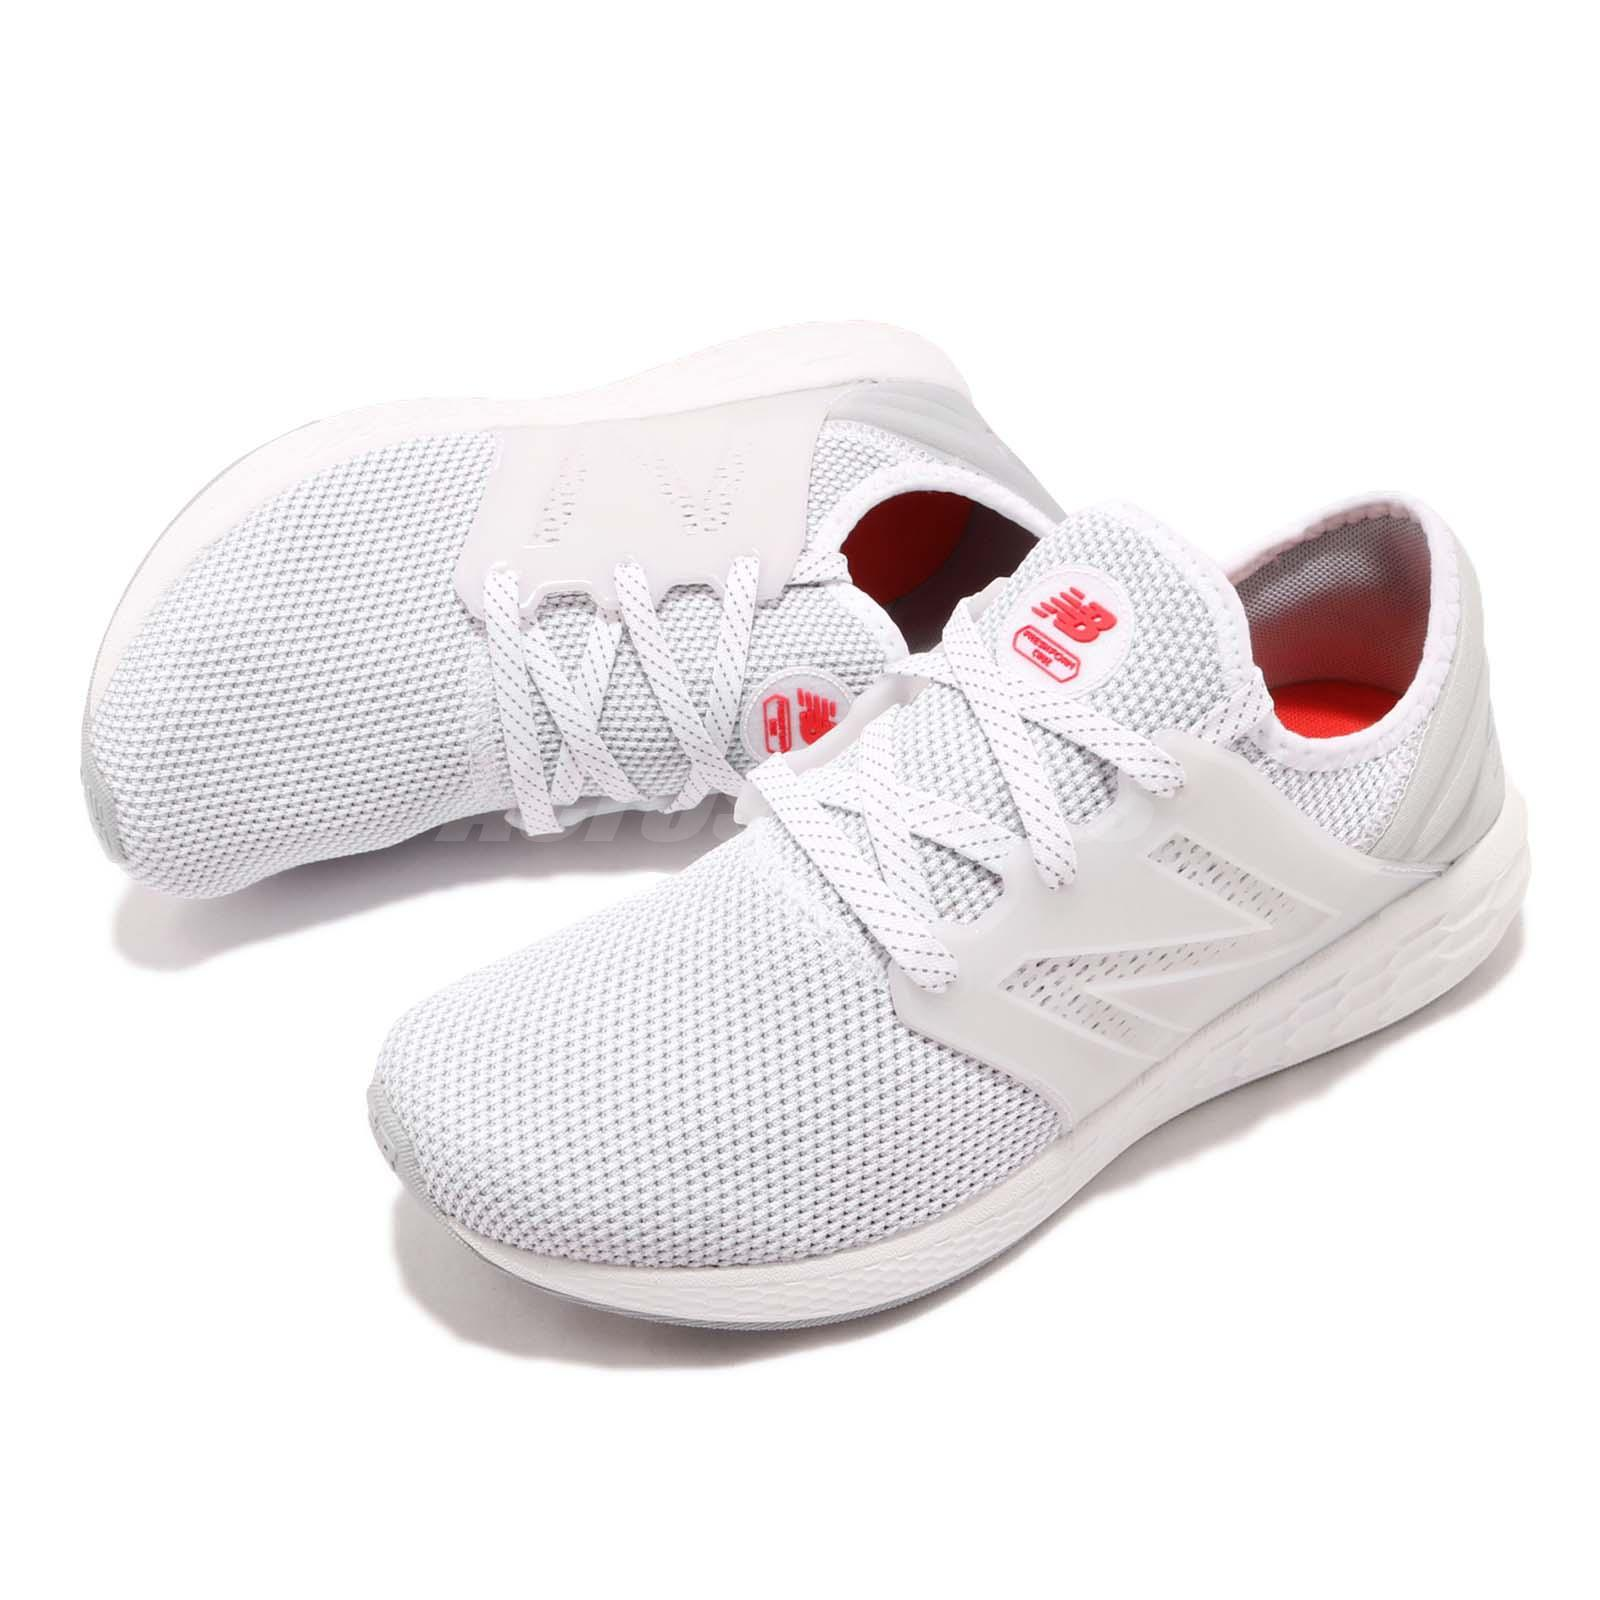 new balance shoes white